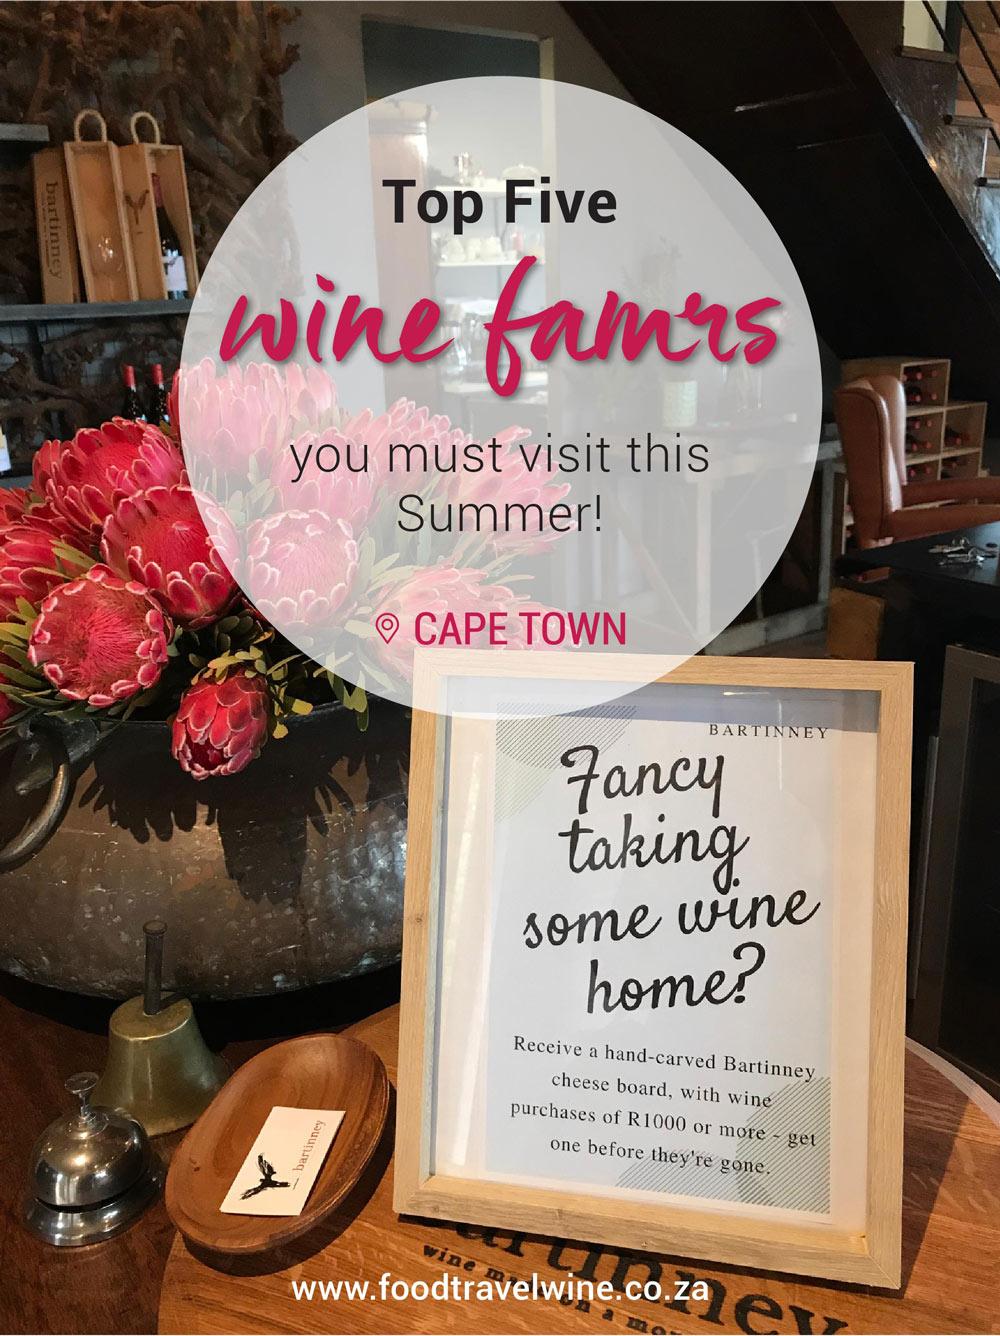 Top 5 Wine Farms